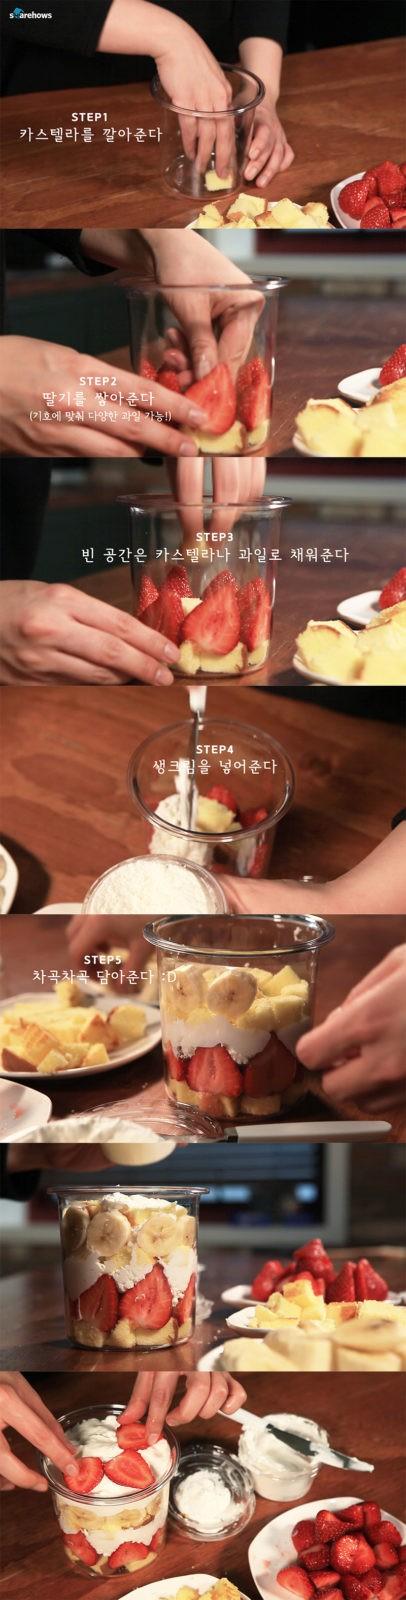 how-to-make-bottle-cake 01